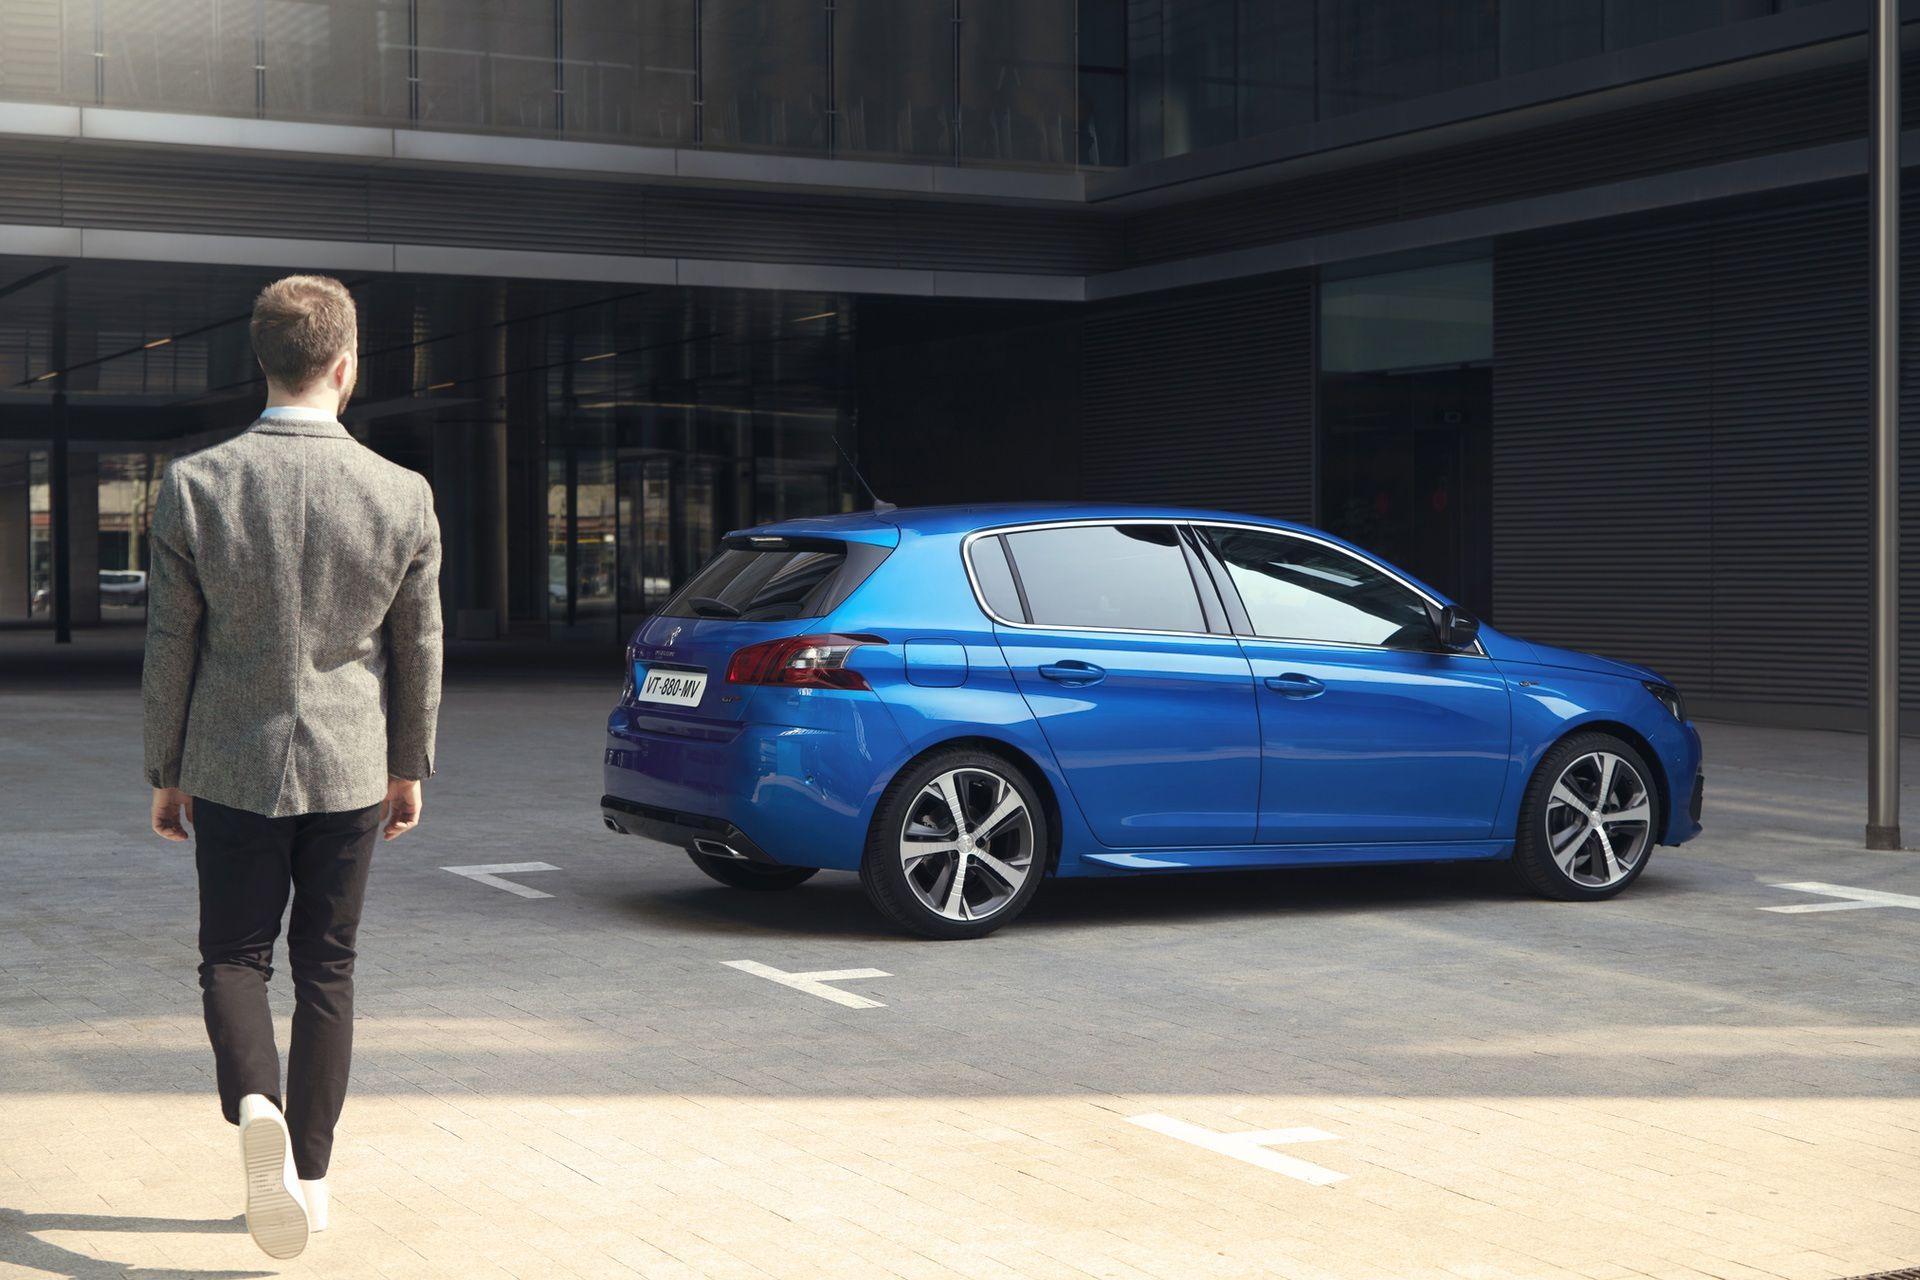 2020_Peugeot_308_facelift_0000